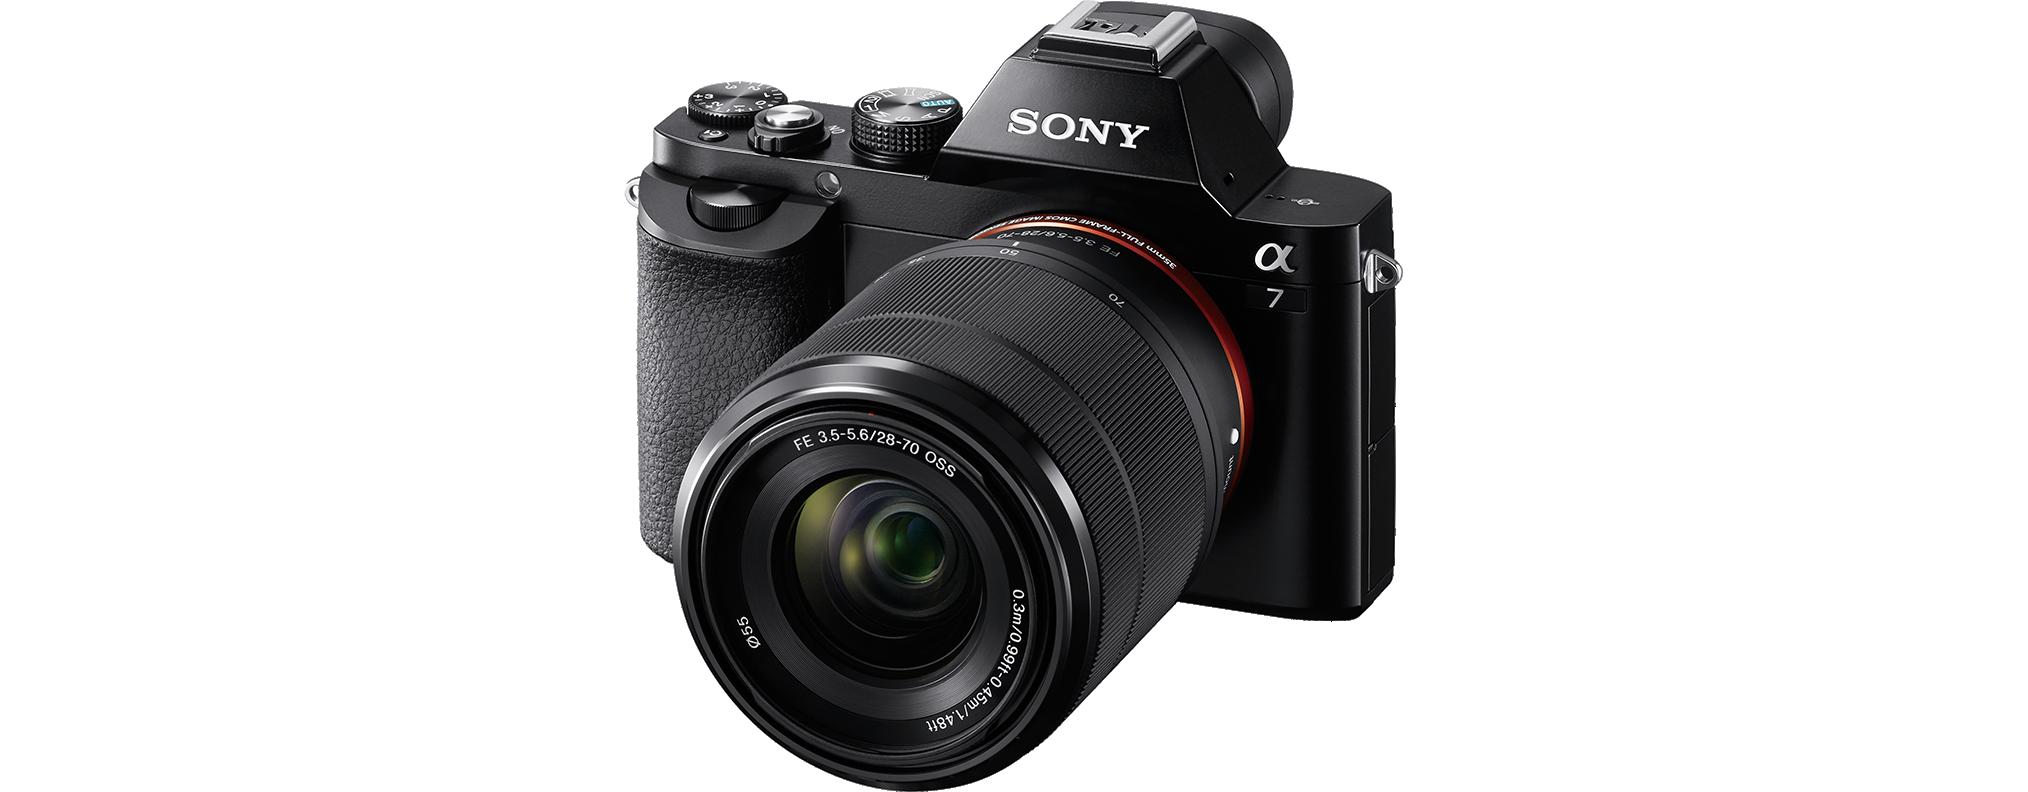 C Mara Evil Sony Alpha 7 Con Objetivo Zoom 28 70 Mm Electr Nica